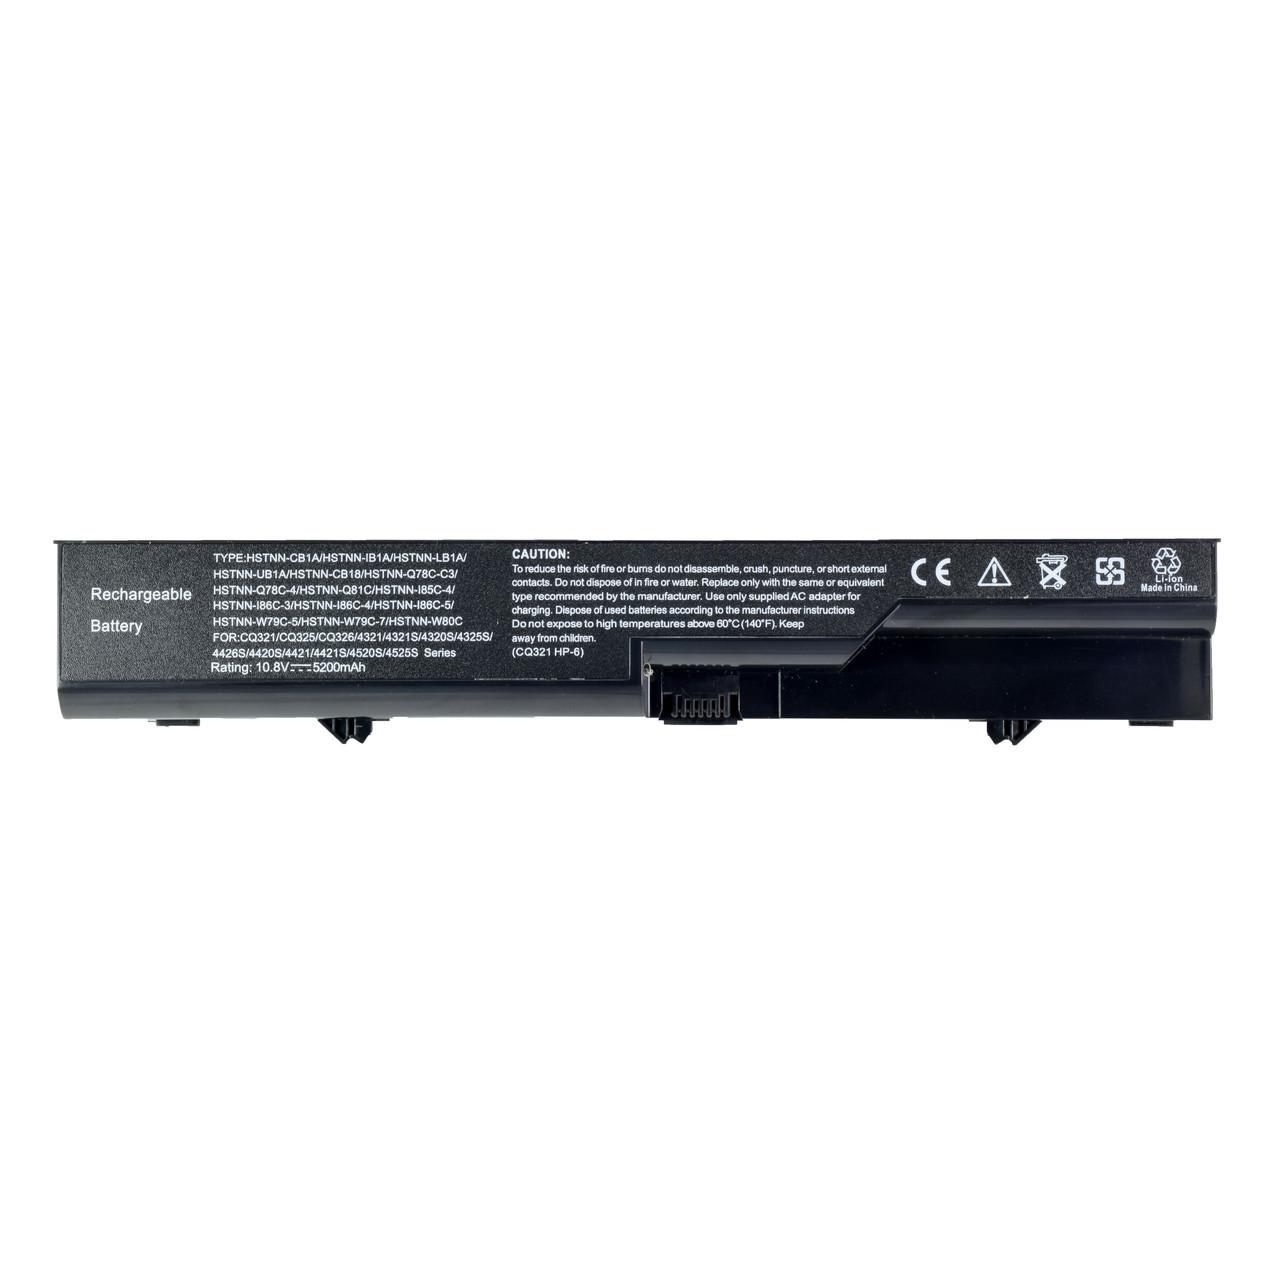 Батарея для ноутбука HSTNN-I85C HSTNN-I85C-3 HSTNN-I85C-4 HSTNN-I85C-5 HSTNN-I86C HSTNN-I86C-3